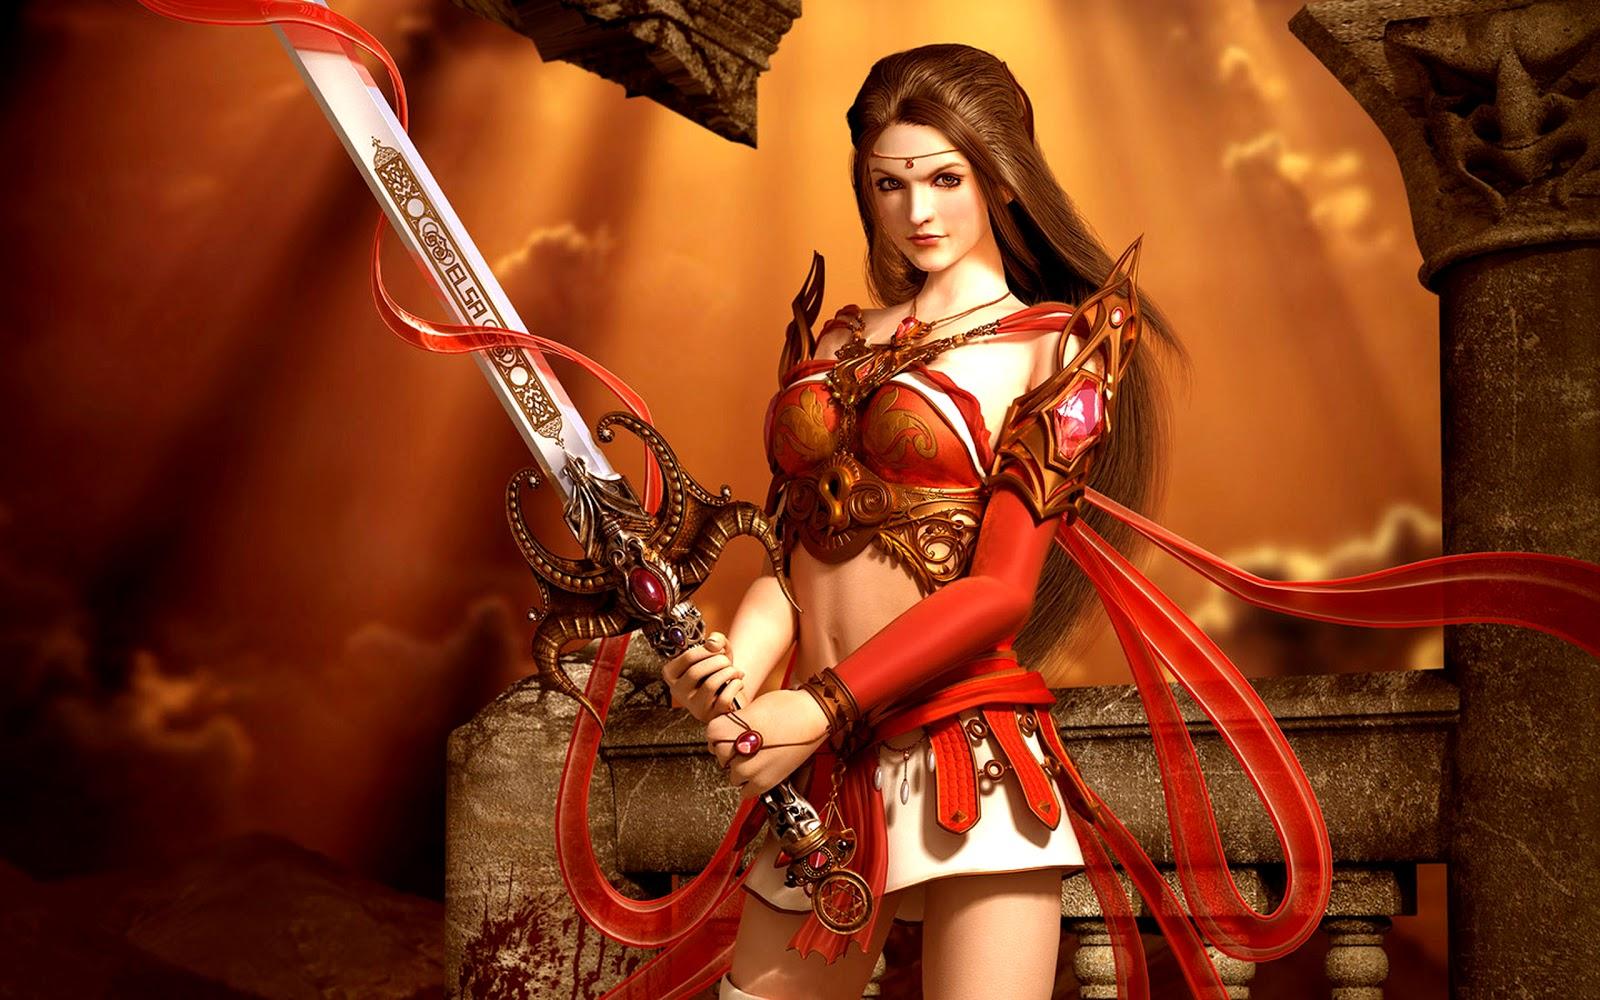 Warrior of the dark knight fantasy wallpapers - Fantasy female warrior artwork ...